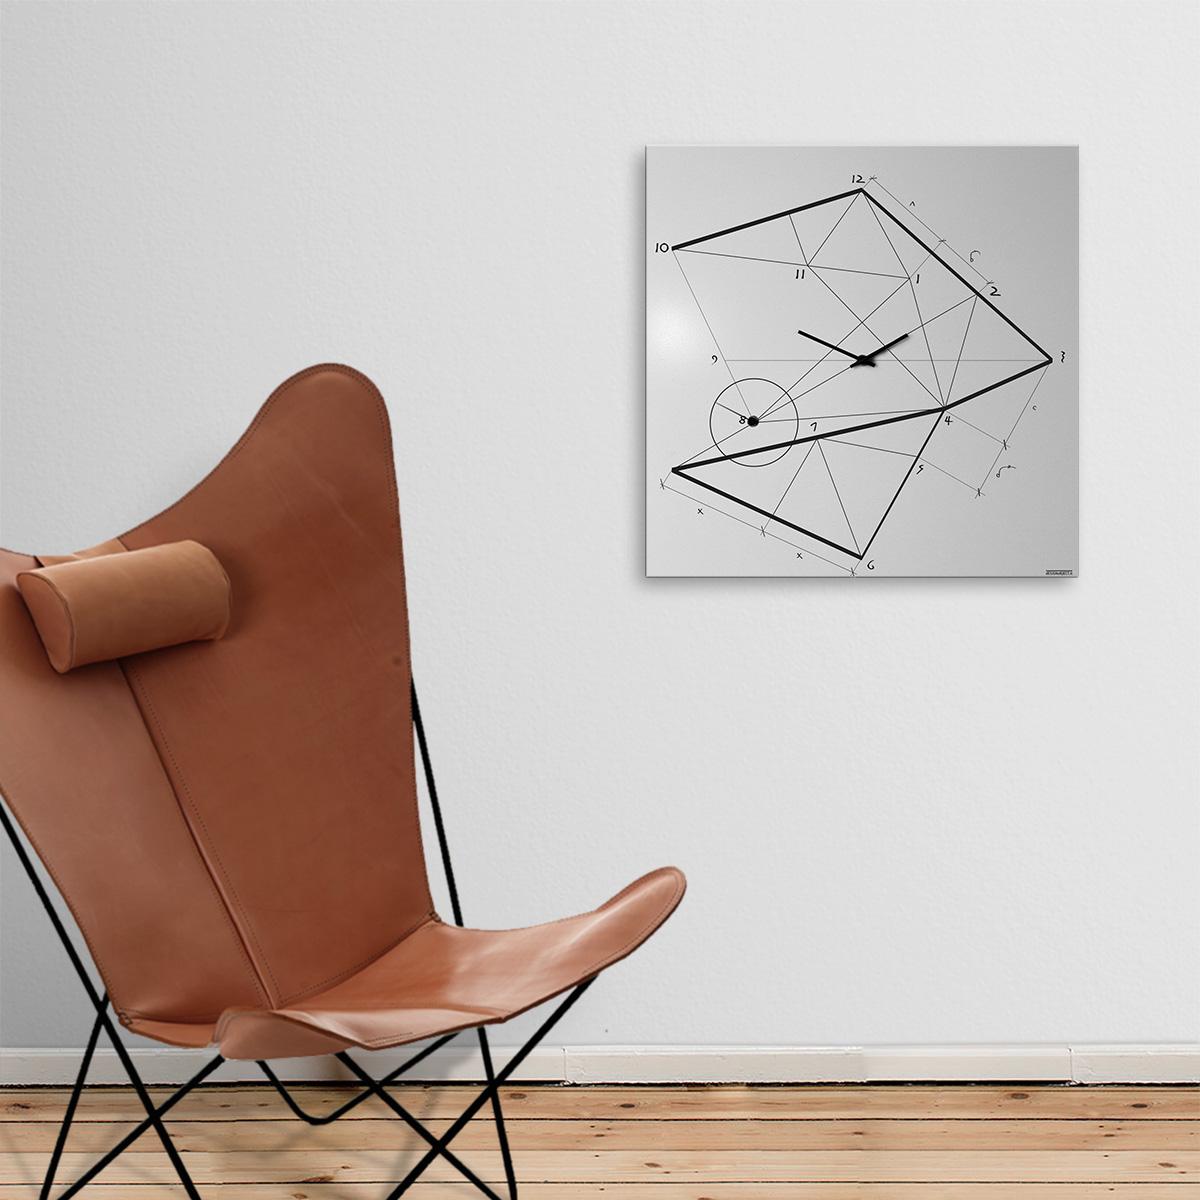 orologio-parete-design-wall-clock-mood-time-line-white-armchair